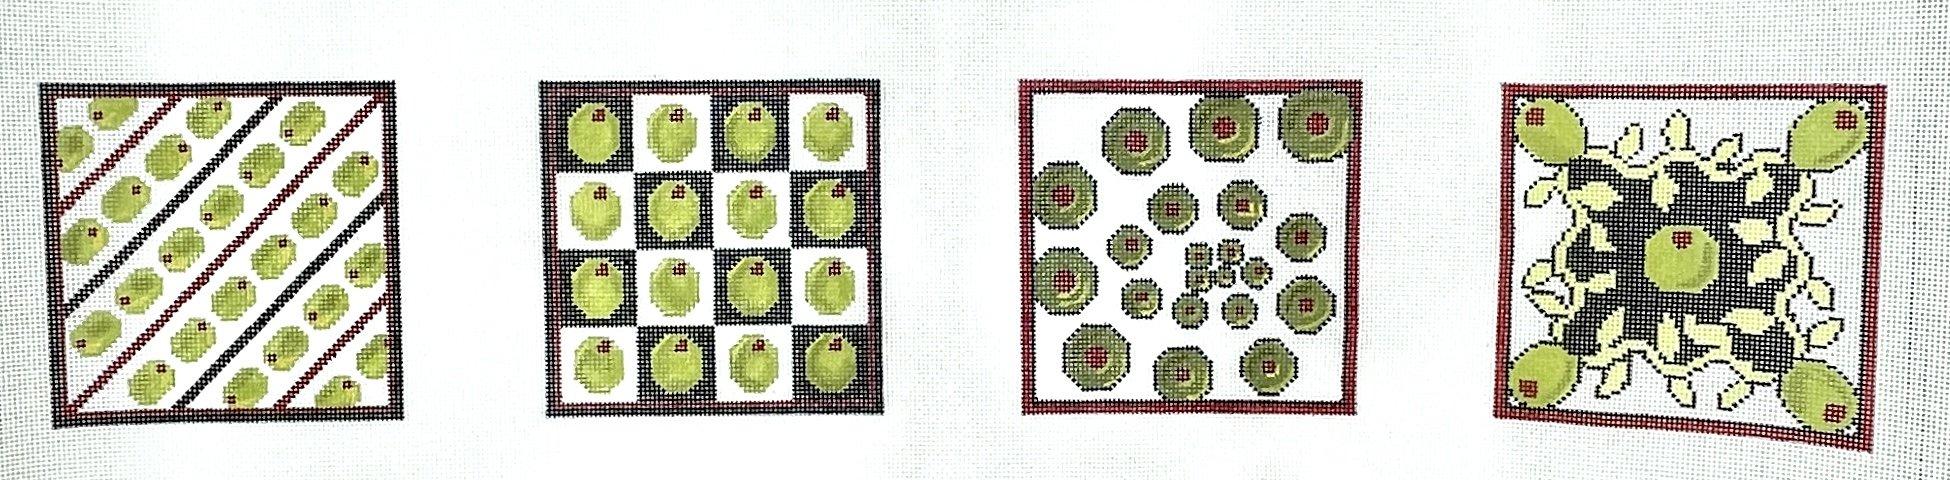 "Olive Coasters - 18m - 4"" Squares"